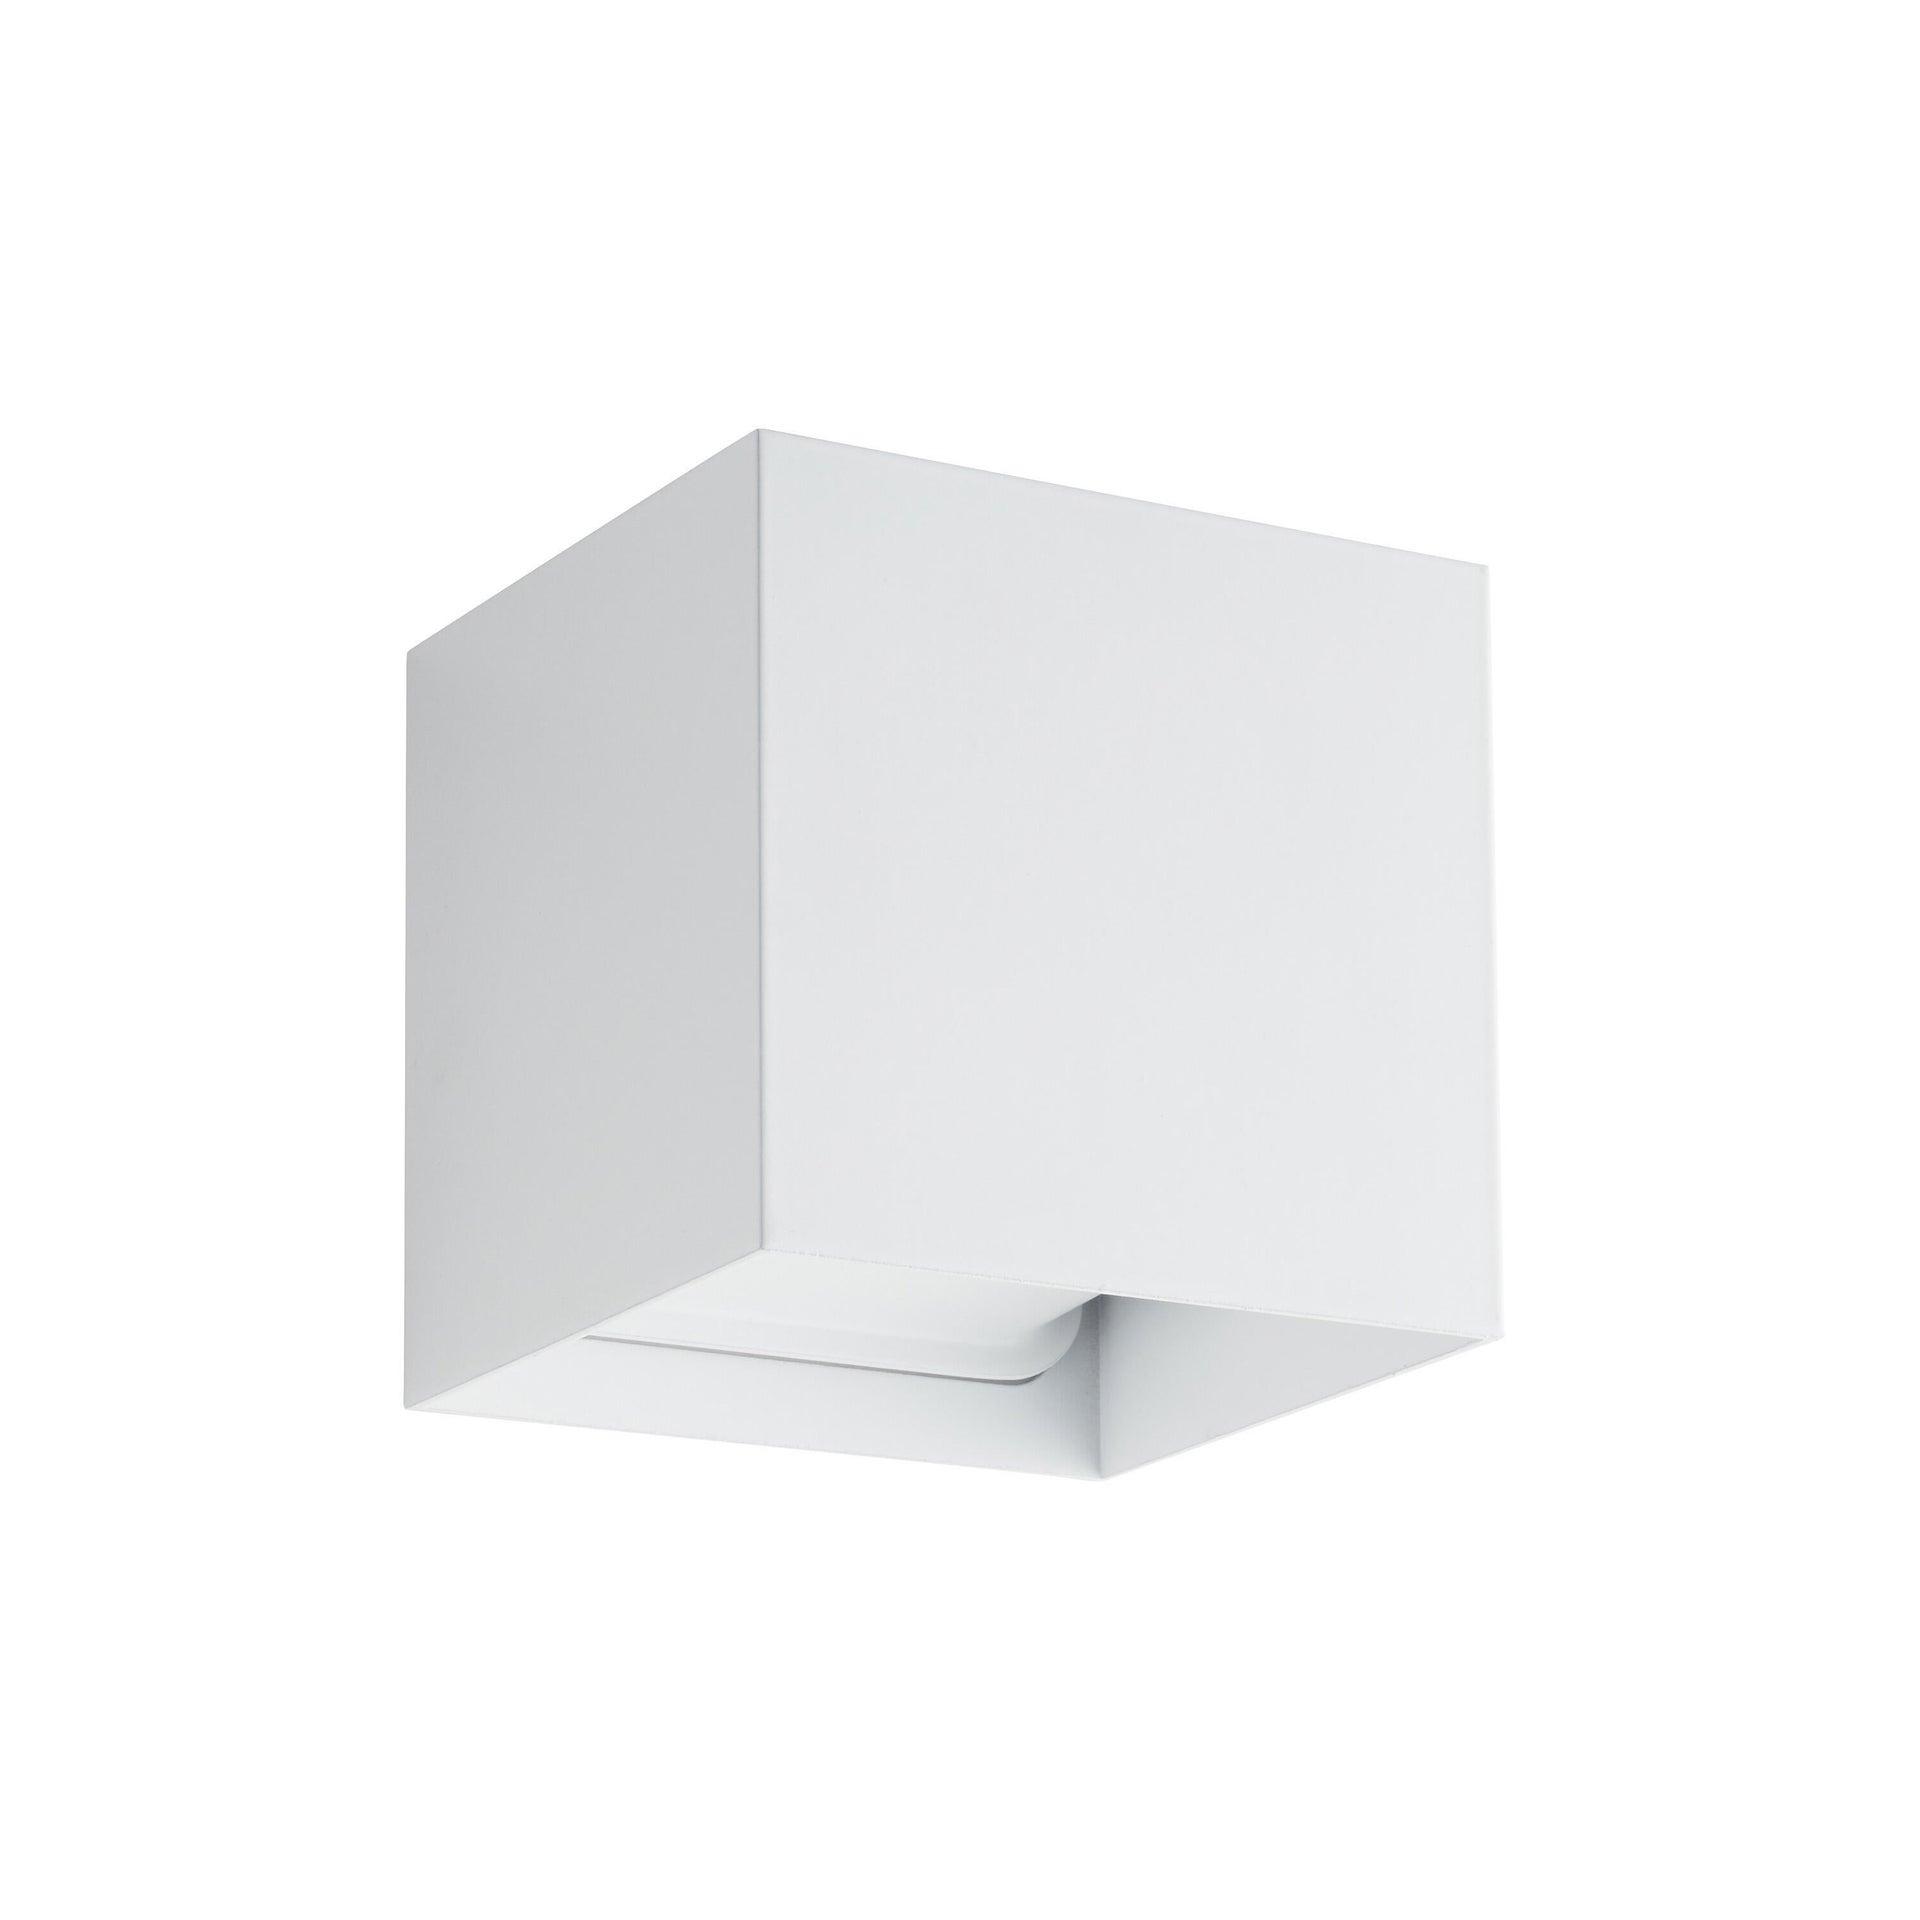 Applique design Kubbo LED integrato bianco, in alluminio, D. 10.0 cm 10.0x10.0 cm, INSPIRE - 3